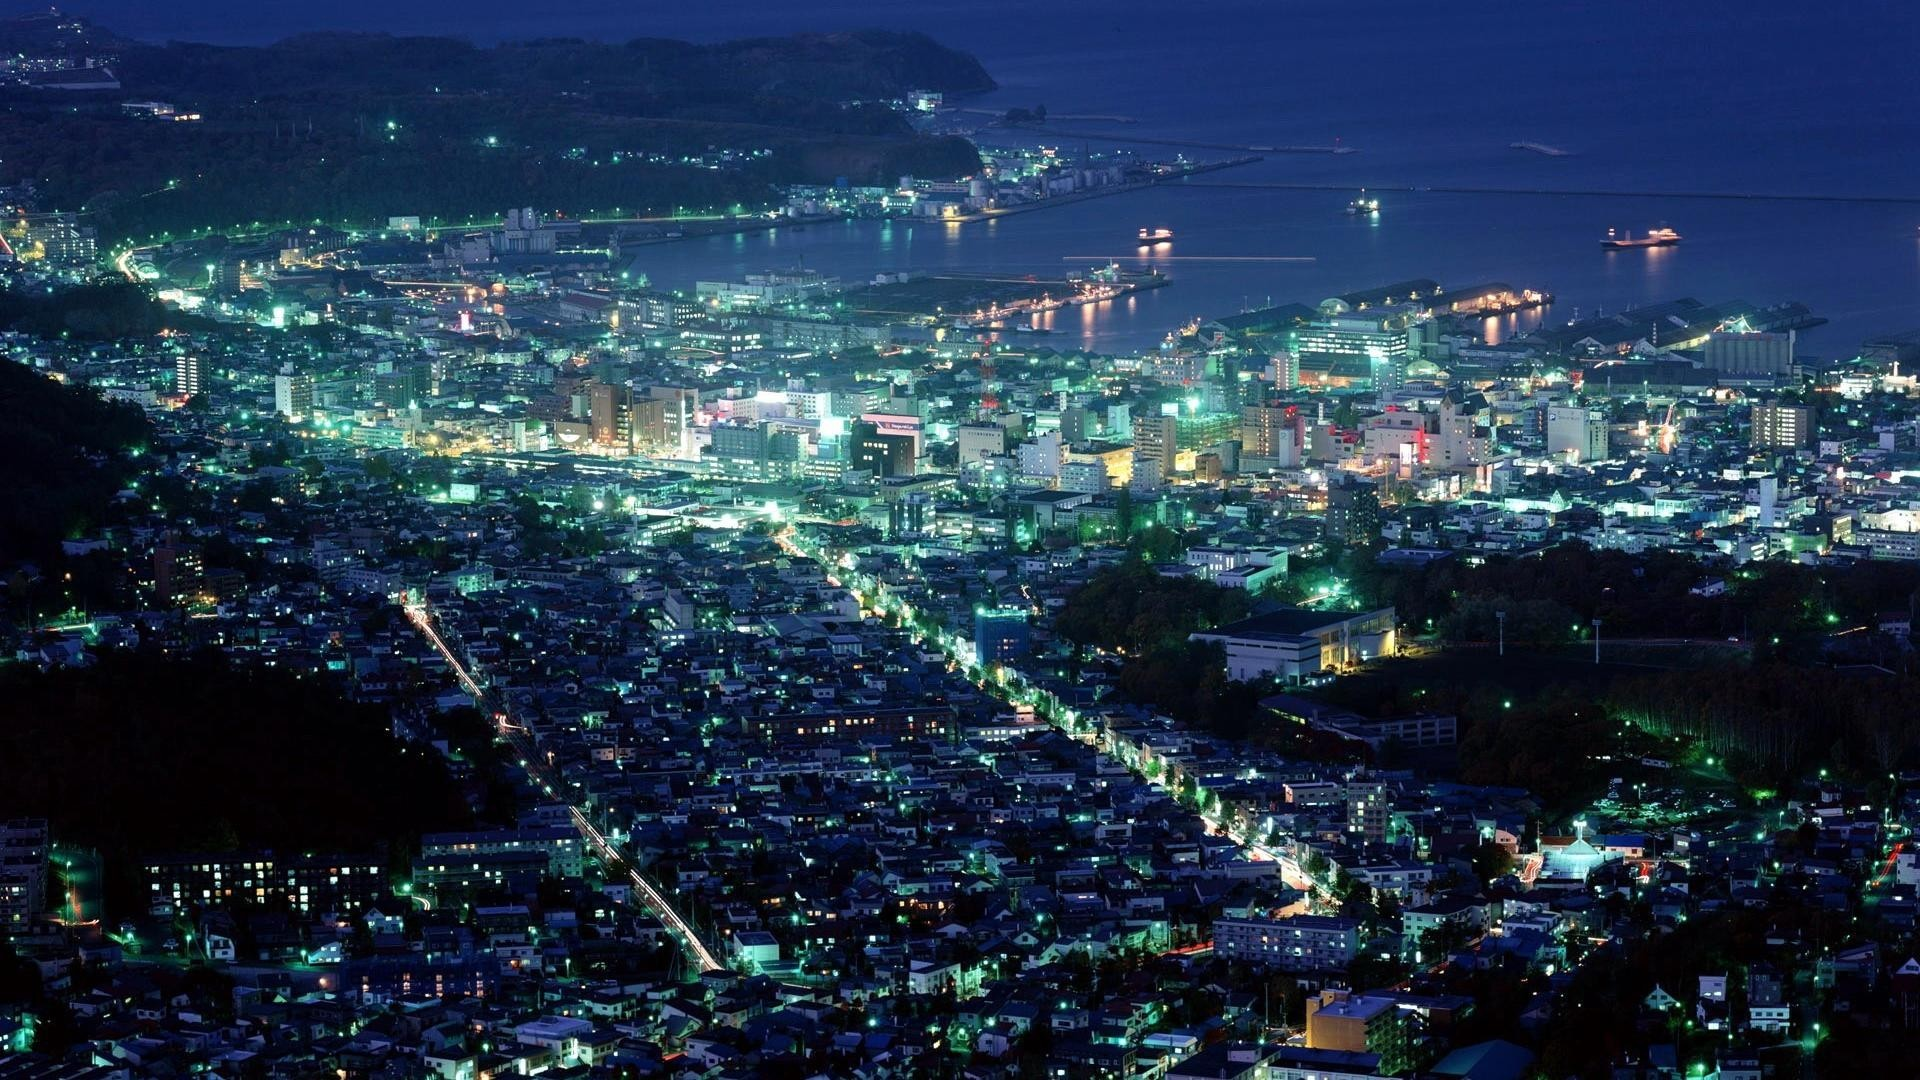 Night City Wallpaper Night, City, Lights, Backgrounds